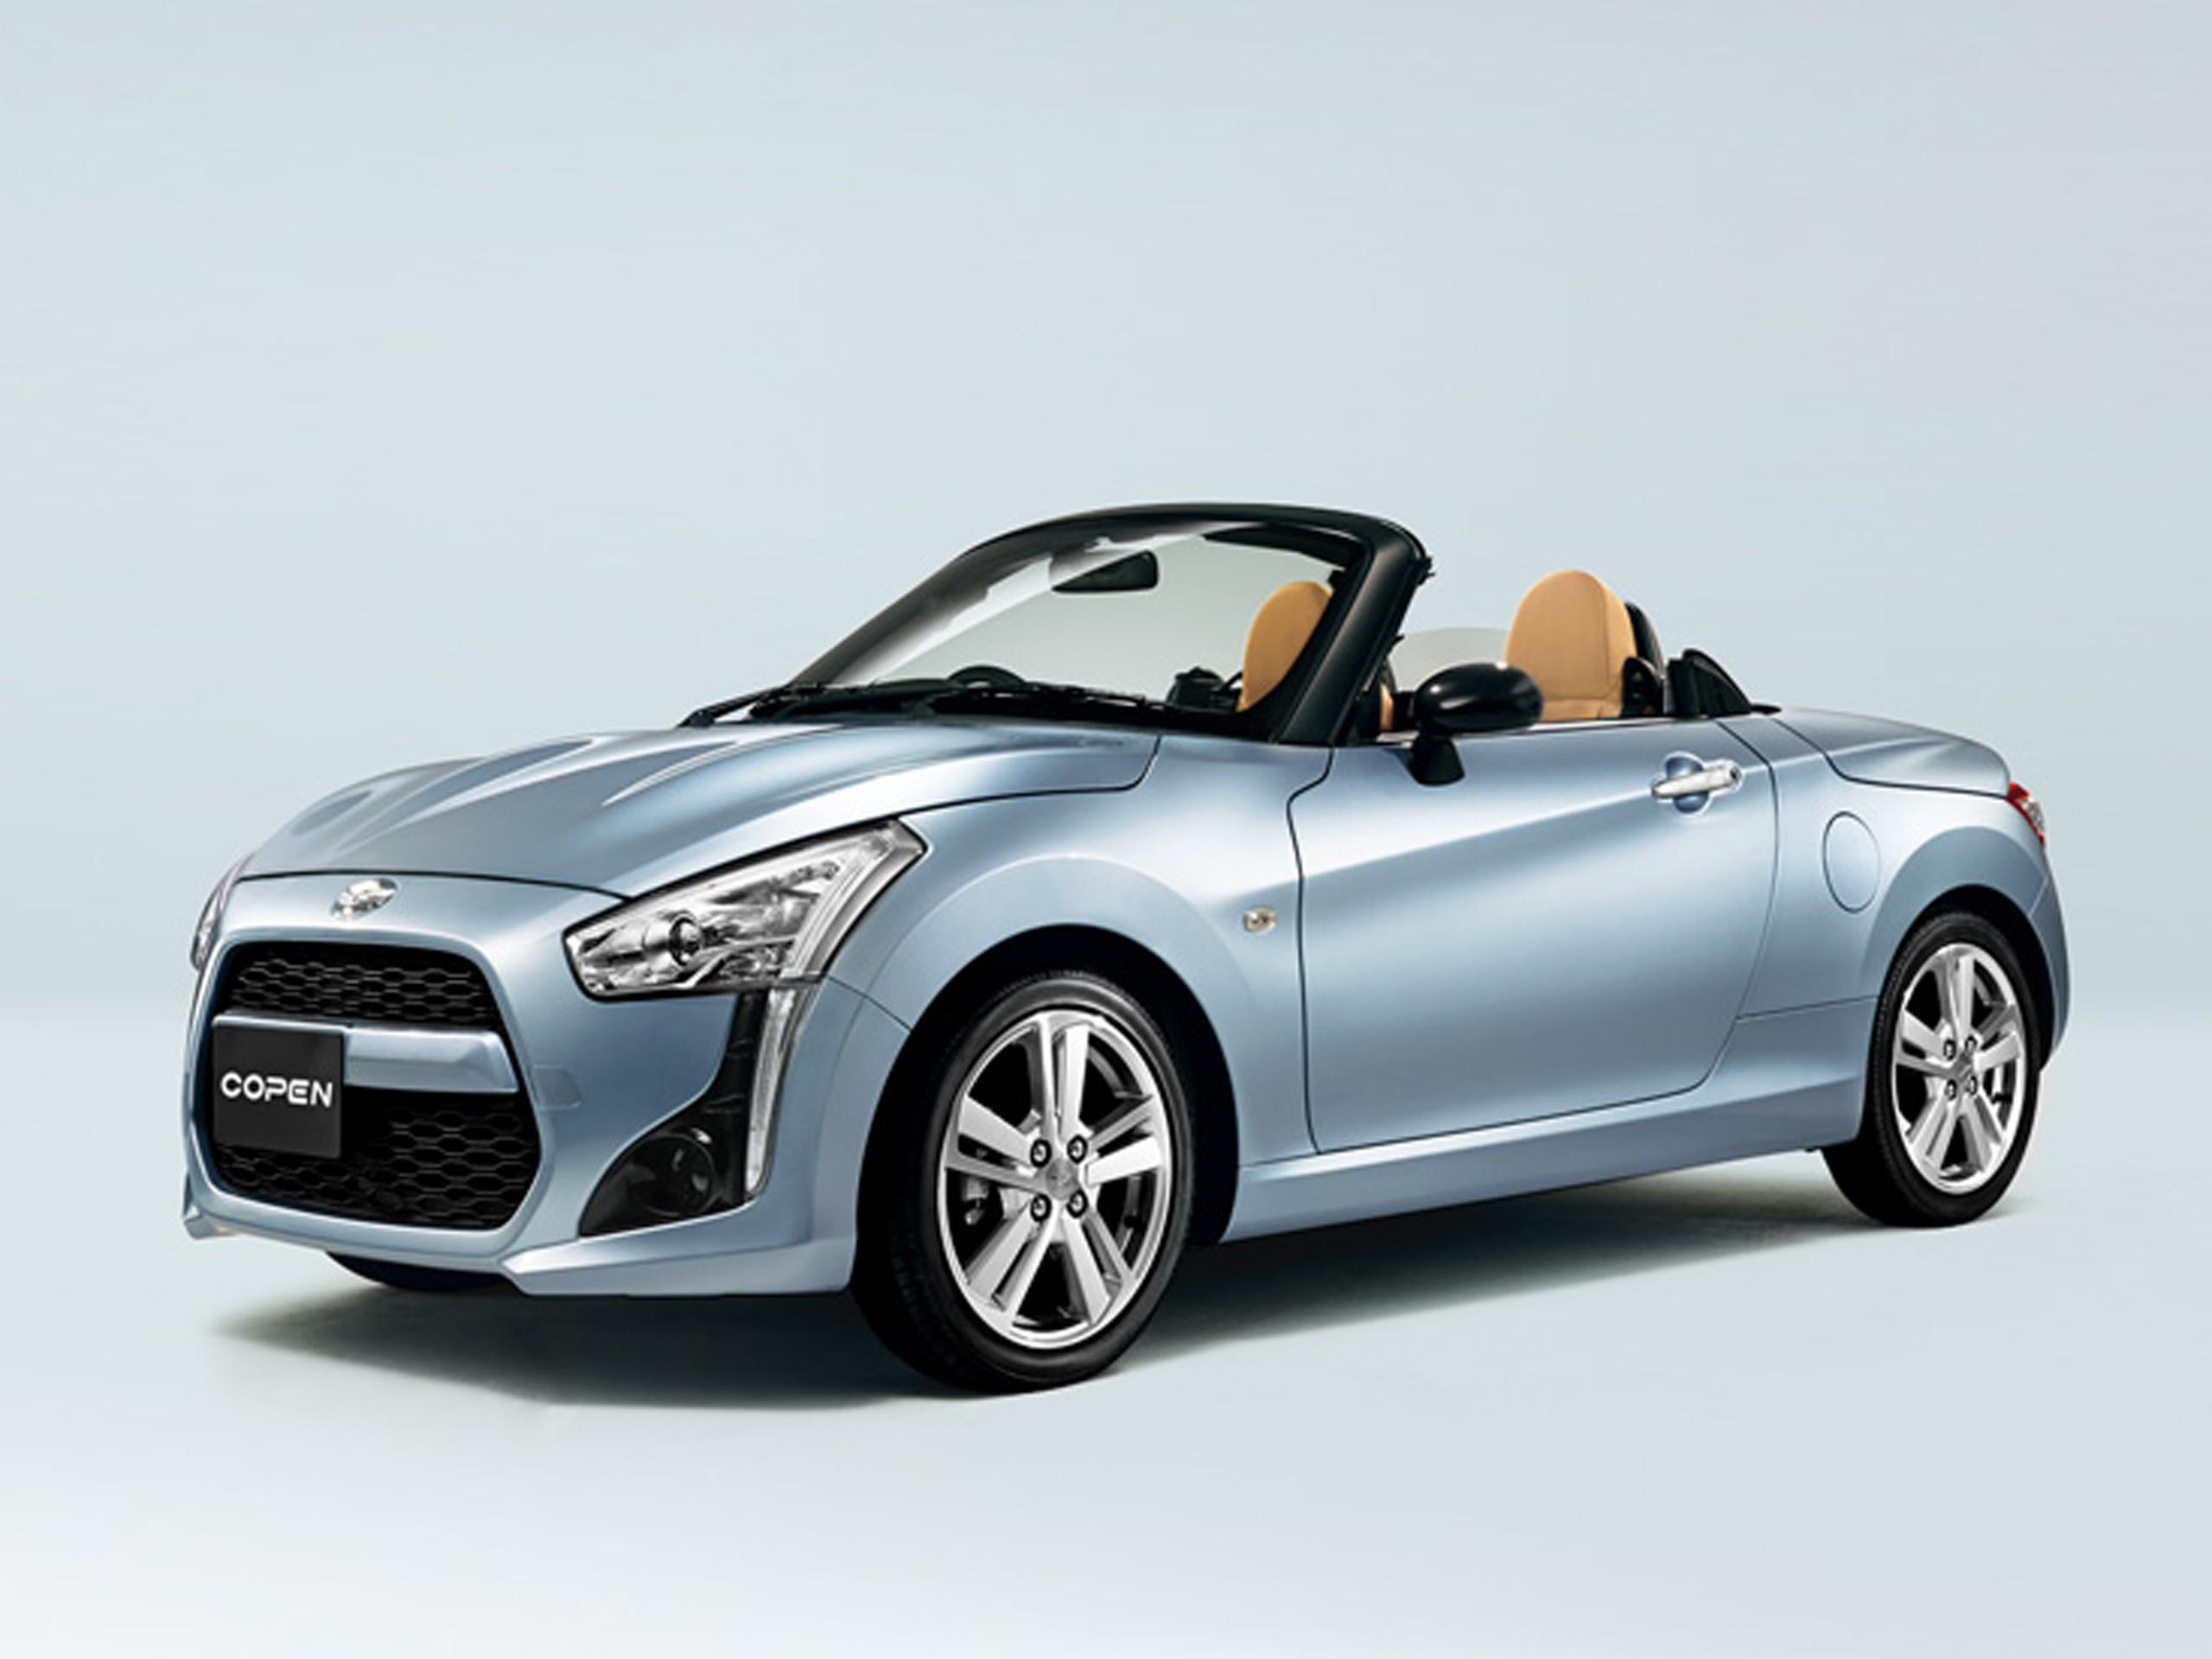 daihatsu copen 2014 neuer klappdach roadster in japan. Black Bedroom Furniture Sets. Home Design Ideas